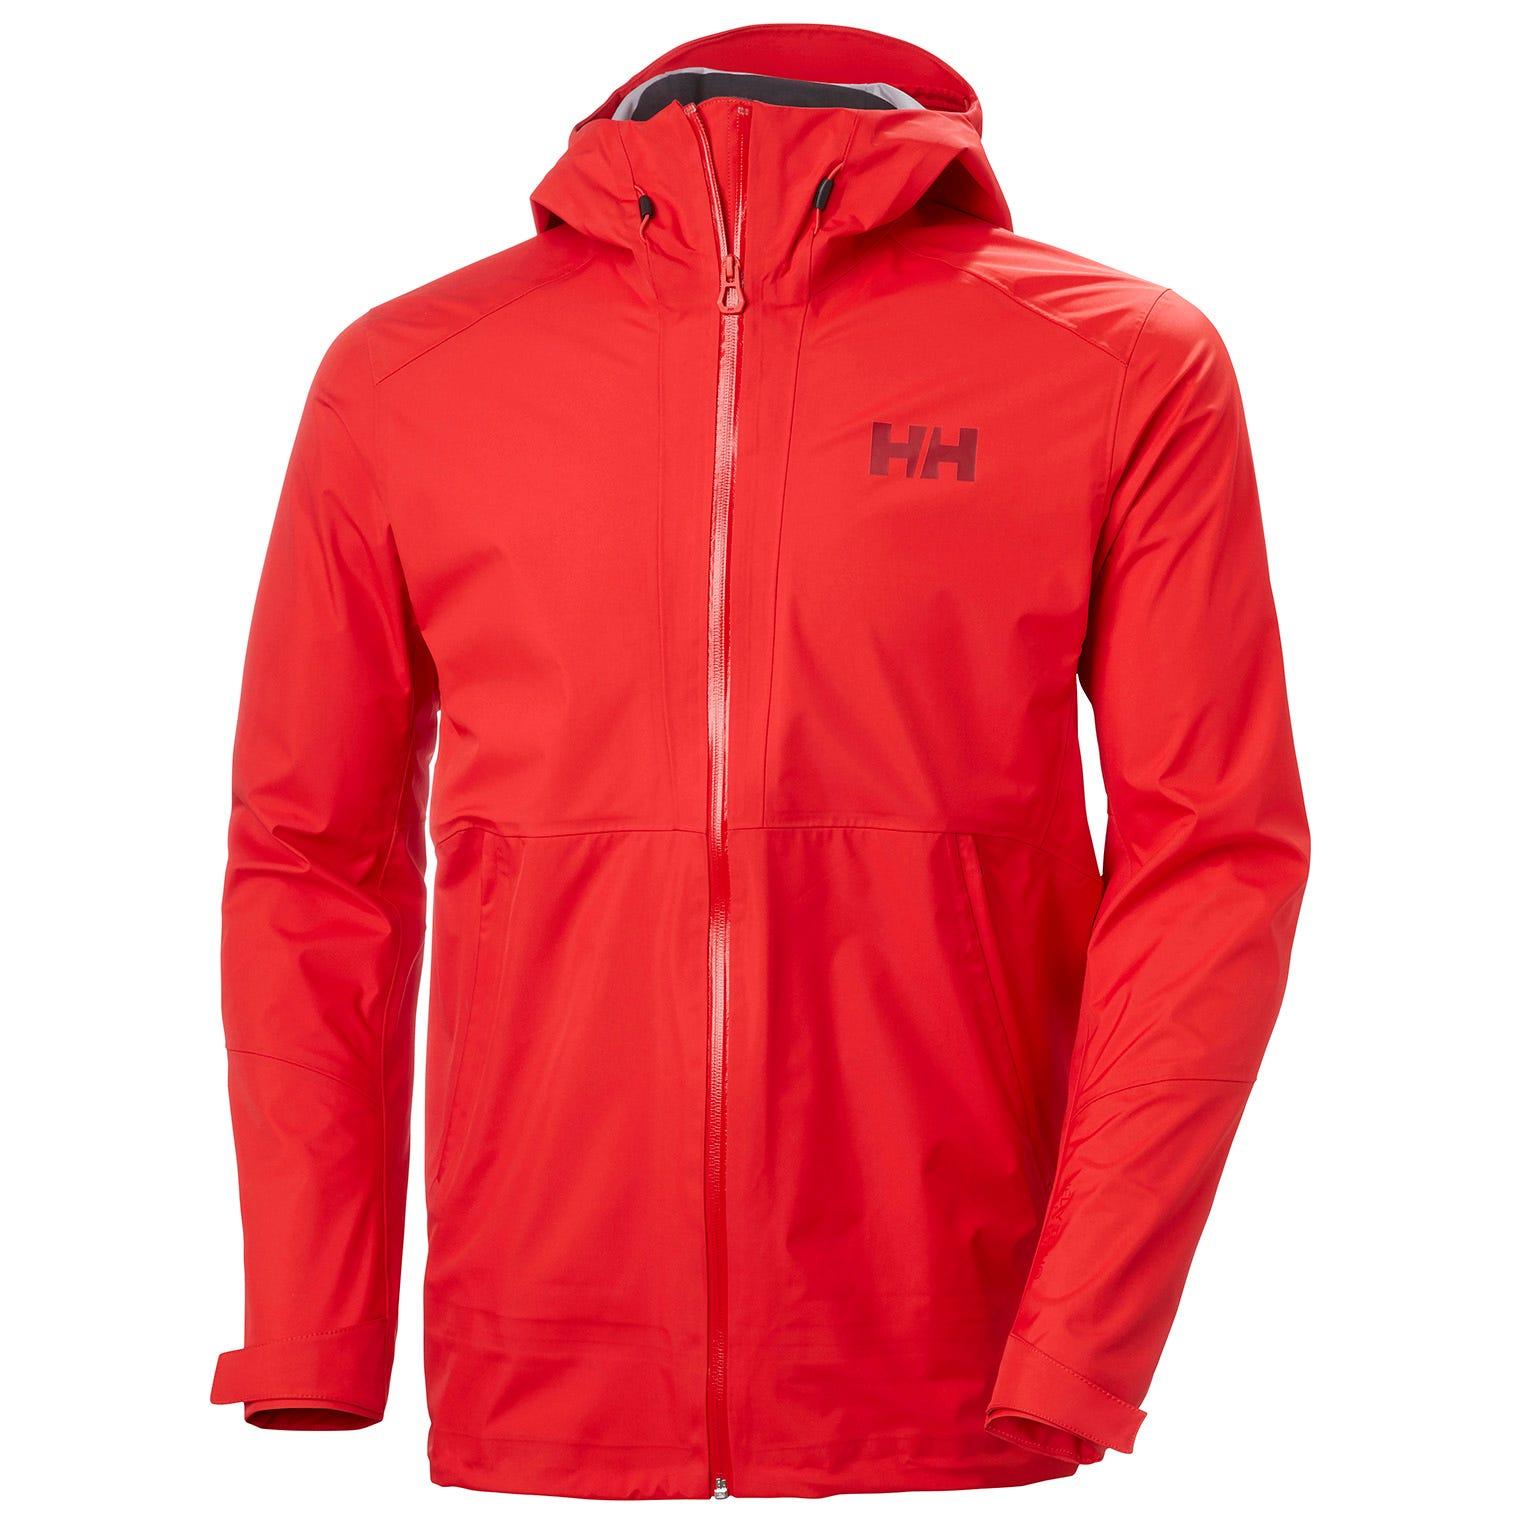 Helly Hansen Vimer 3l Shell Jacket Mens Hiking Red M